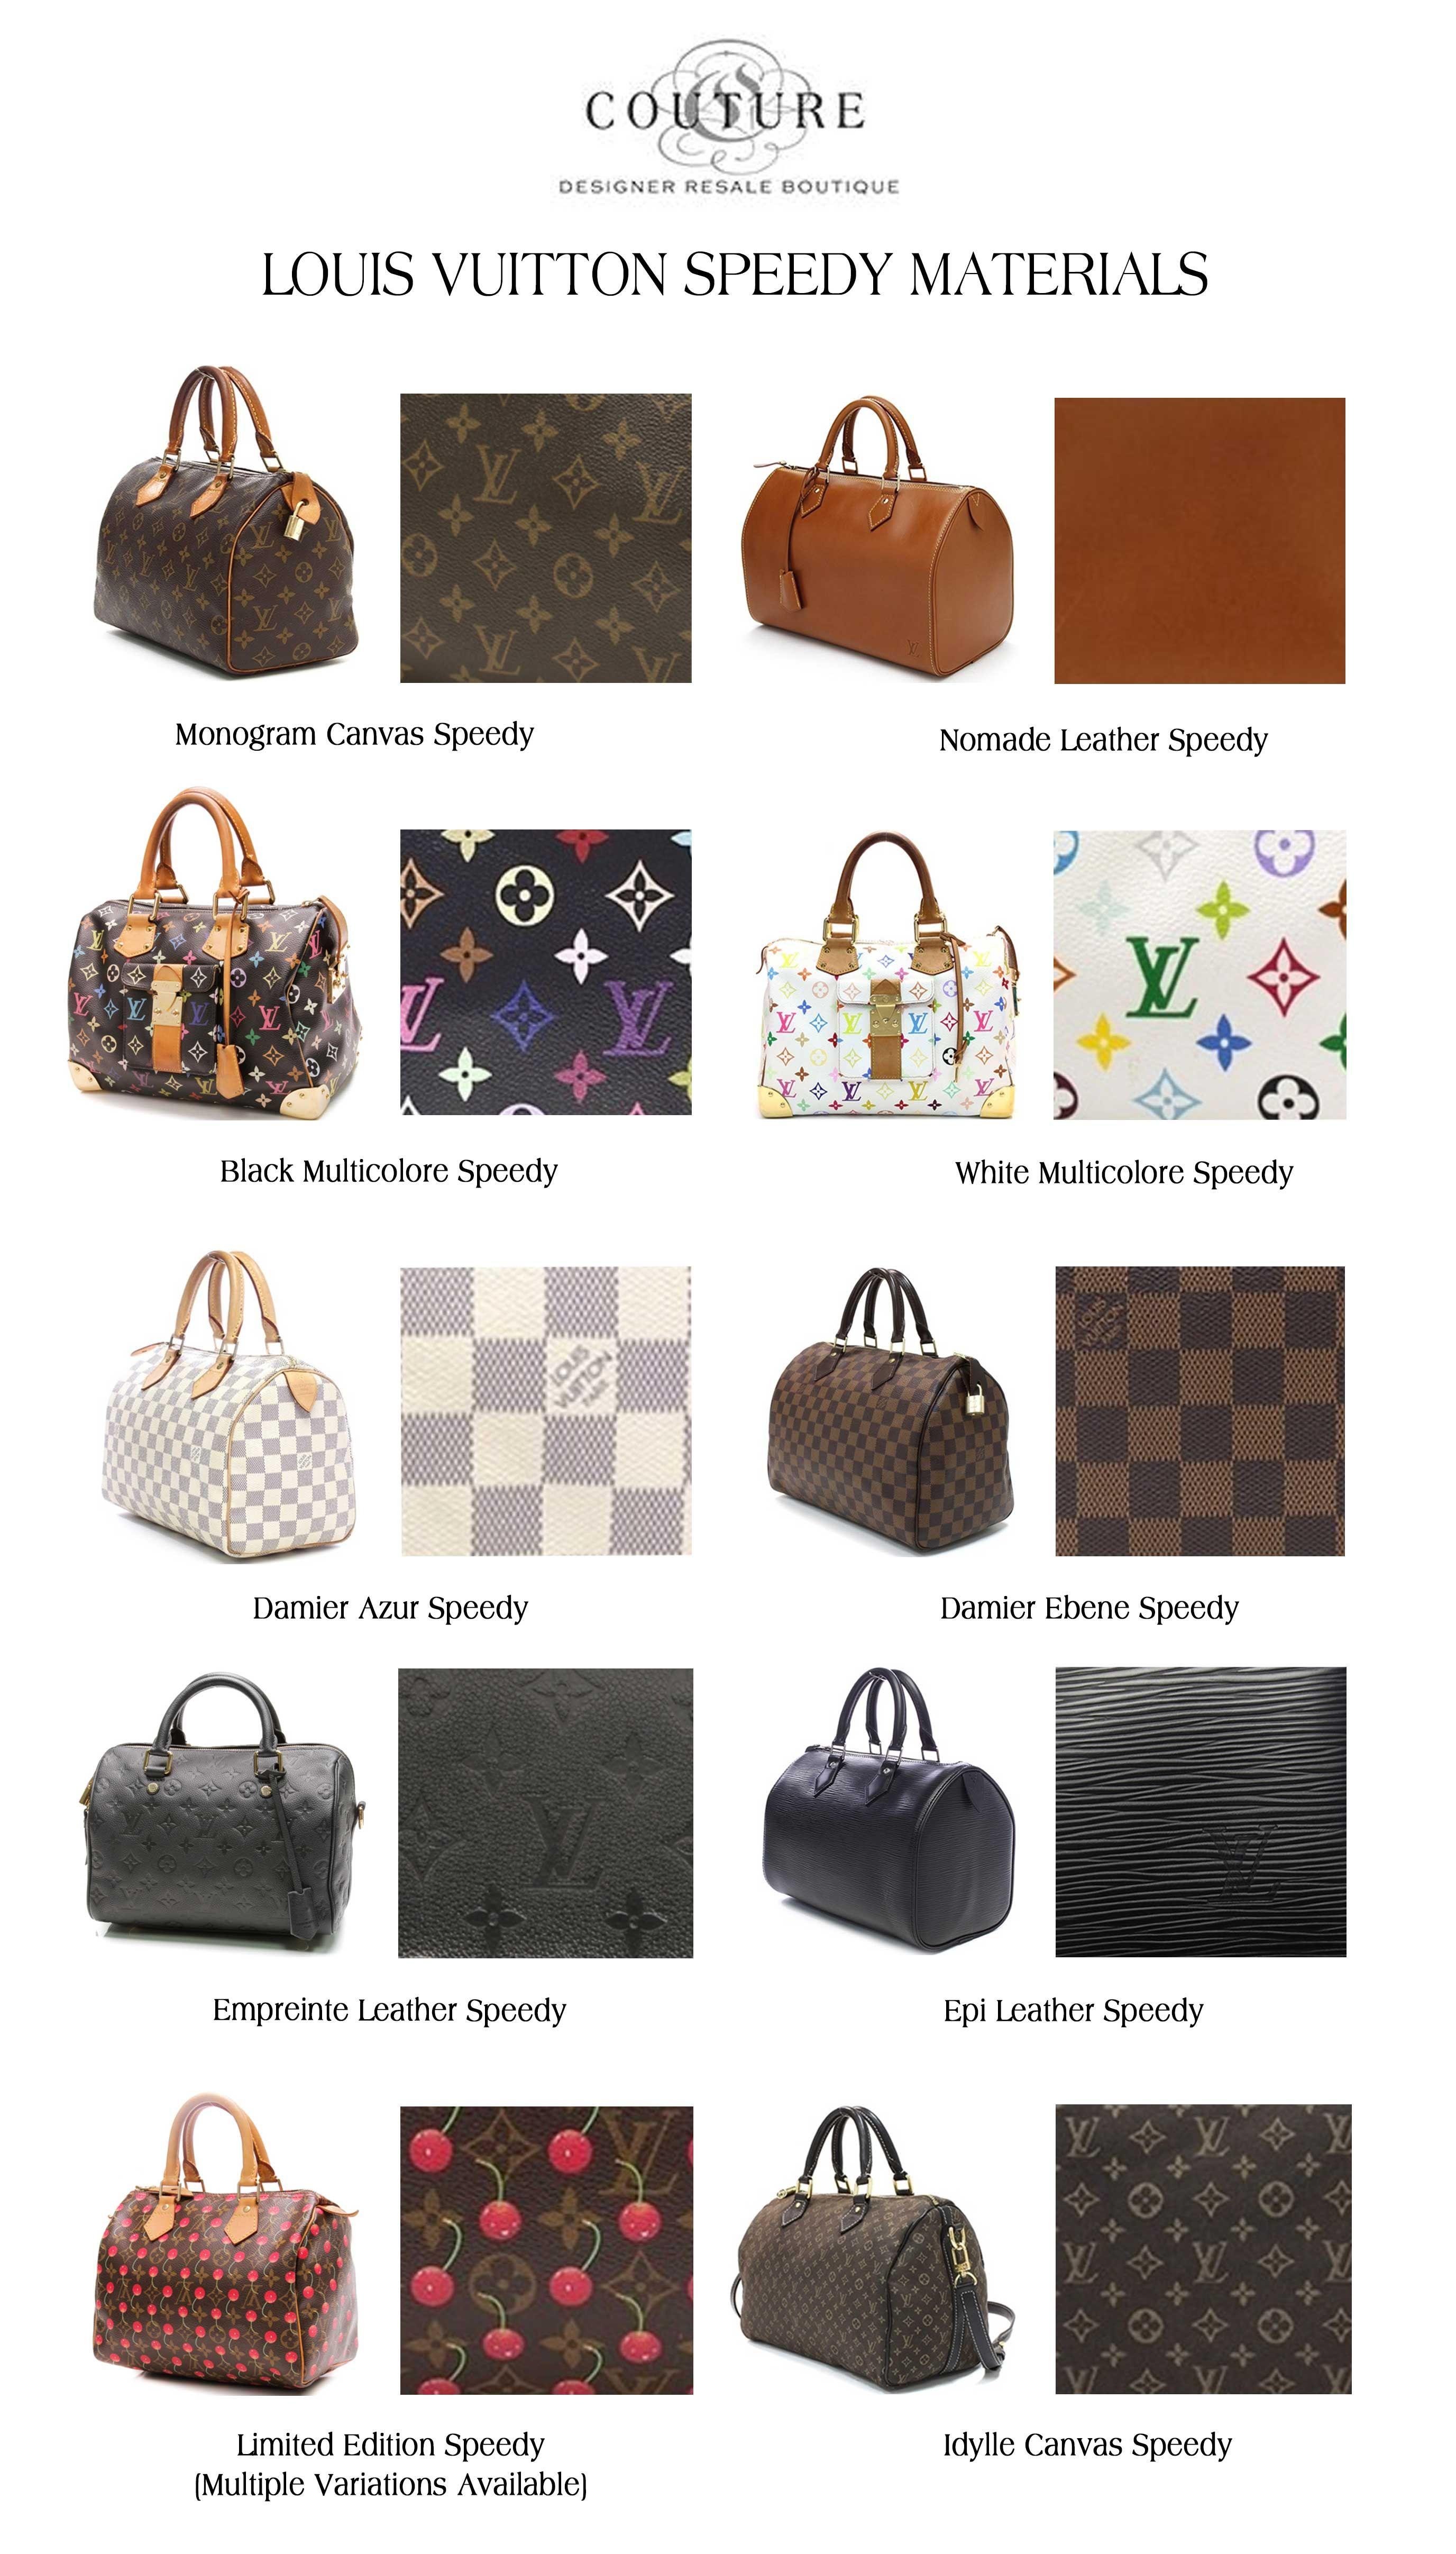 4d7b8c17fb52f Luxury Branding, Branding Design, Louis Vuitton Damier, Louis Vuitton  Speedy, New Inventory